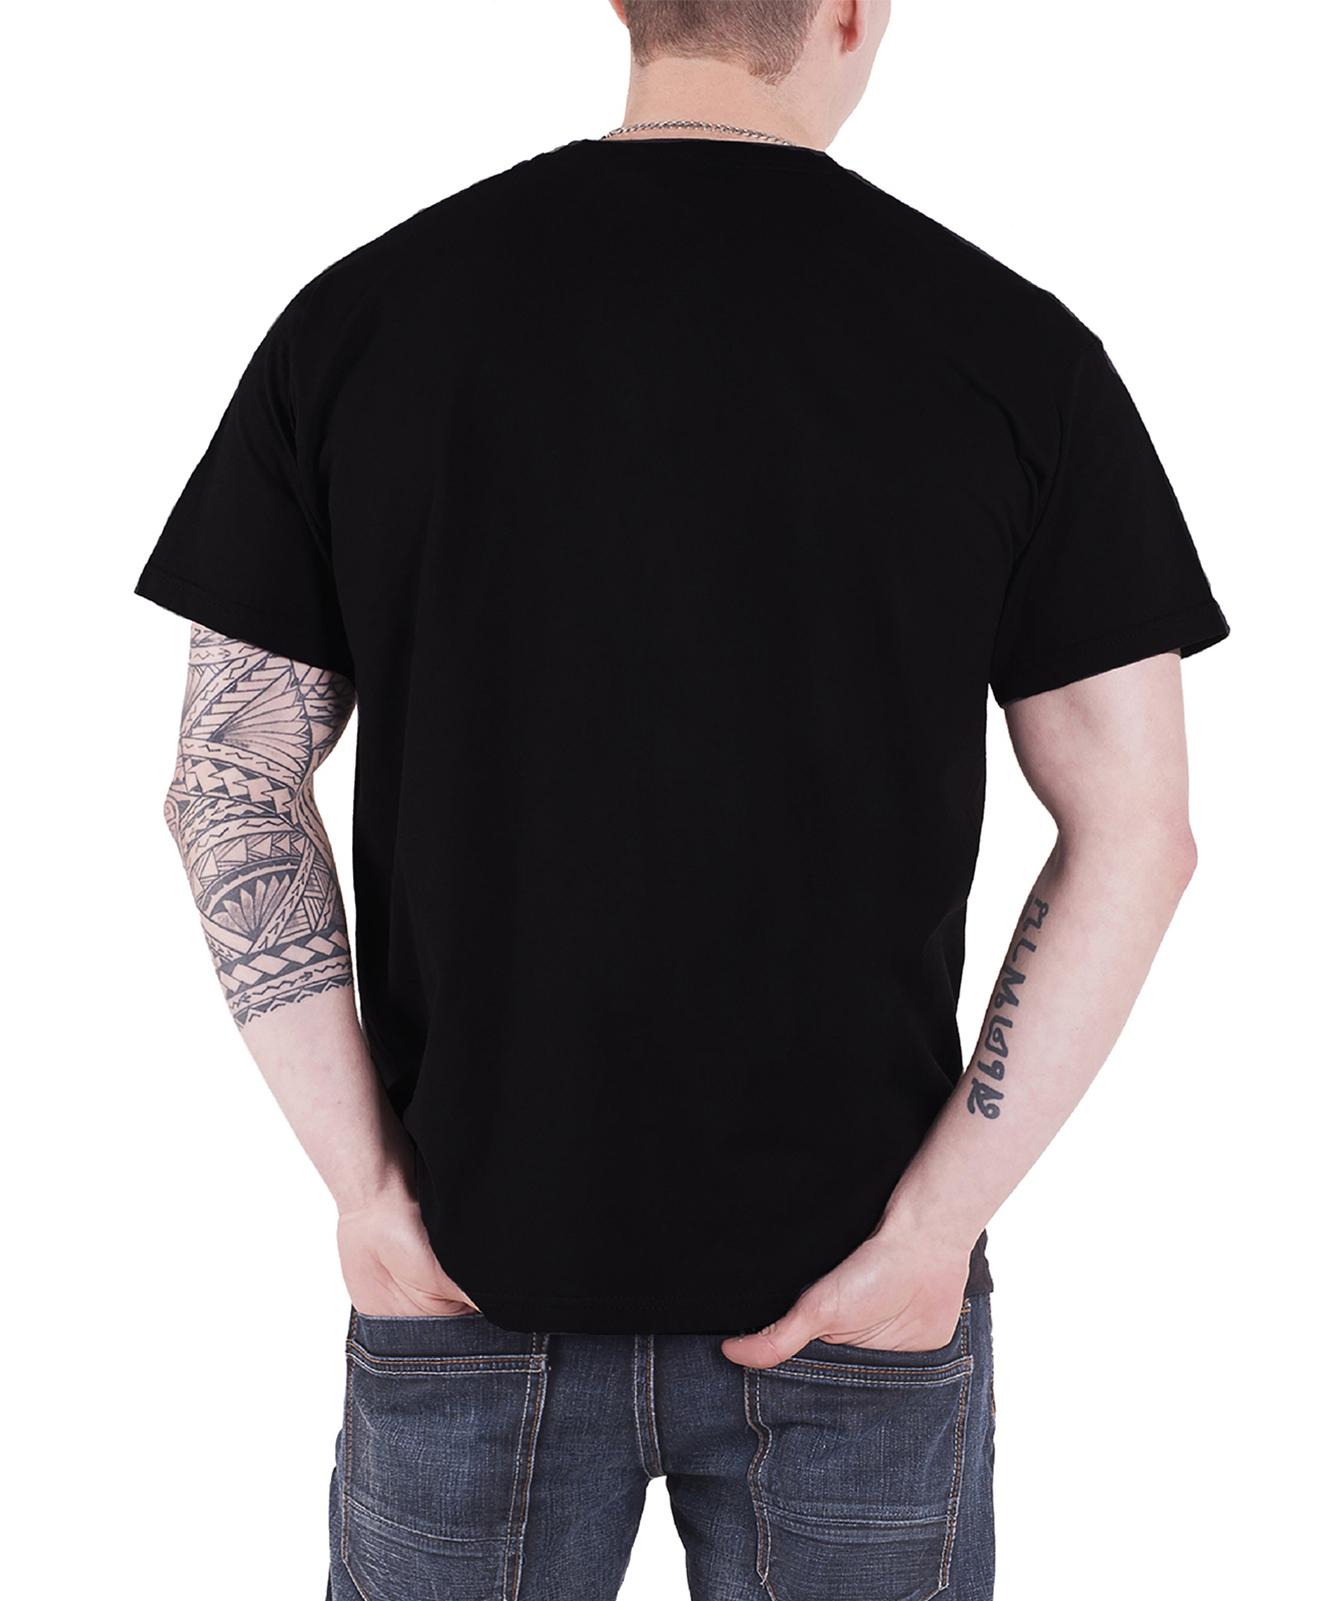 Official-Gas-Monkey-Garage-T-Shirt-Official-GMG-Logo-Kustom-Builds-new-Mens Indexbild 27